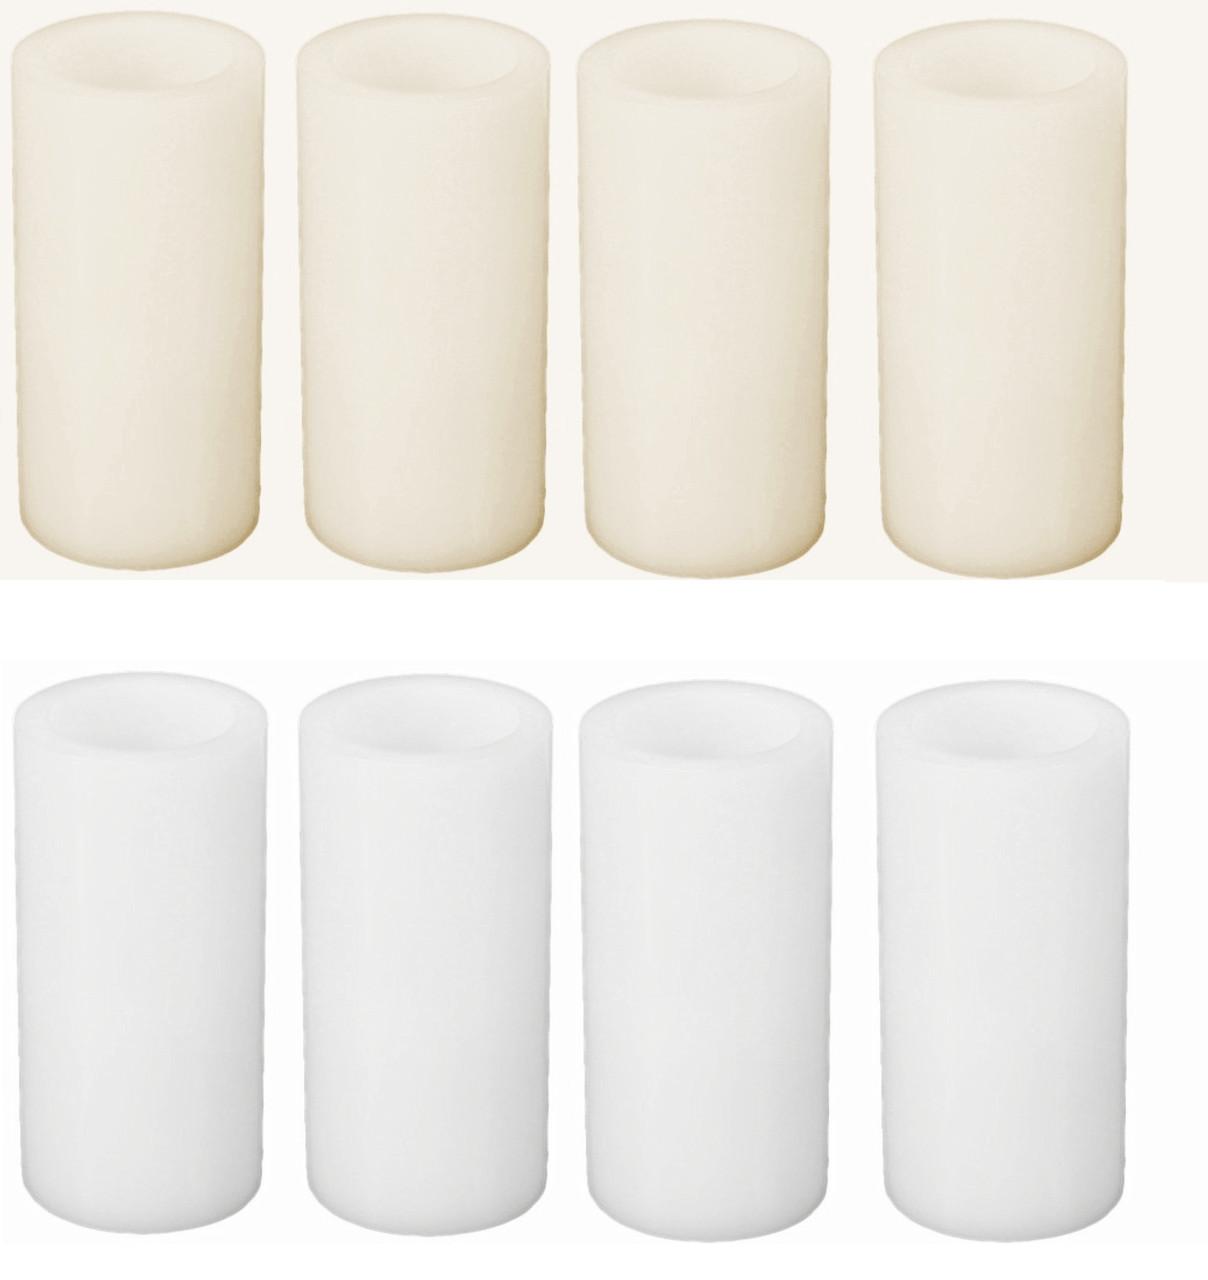 6 led flameless wax pillar candle pack 12 case wholesale. Black Bedroom Furniture Sets. Home Design Ideas